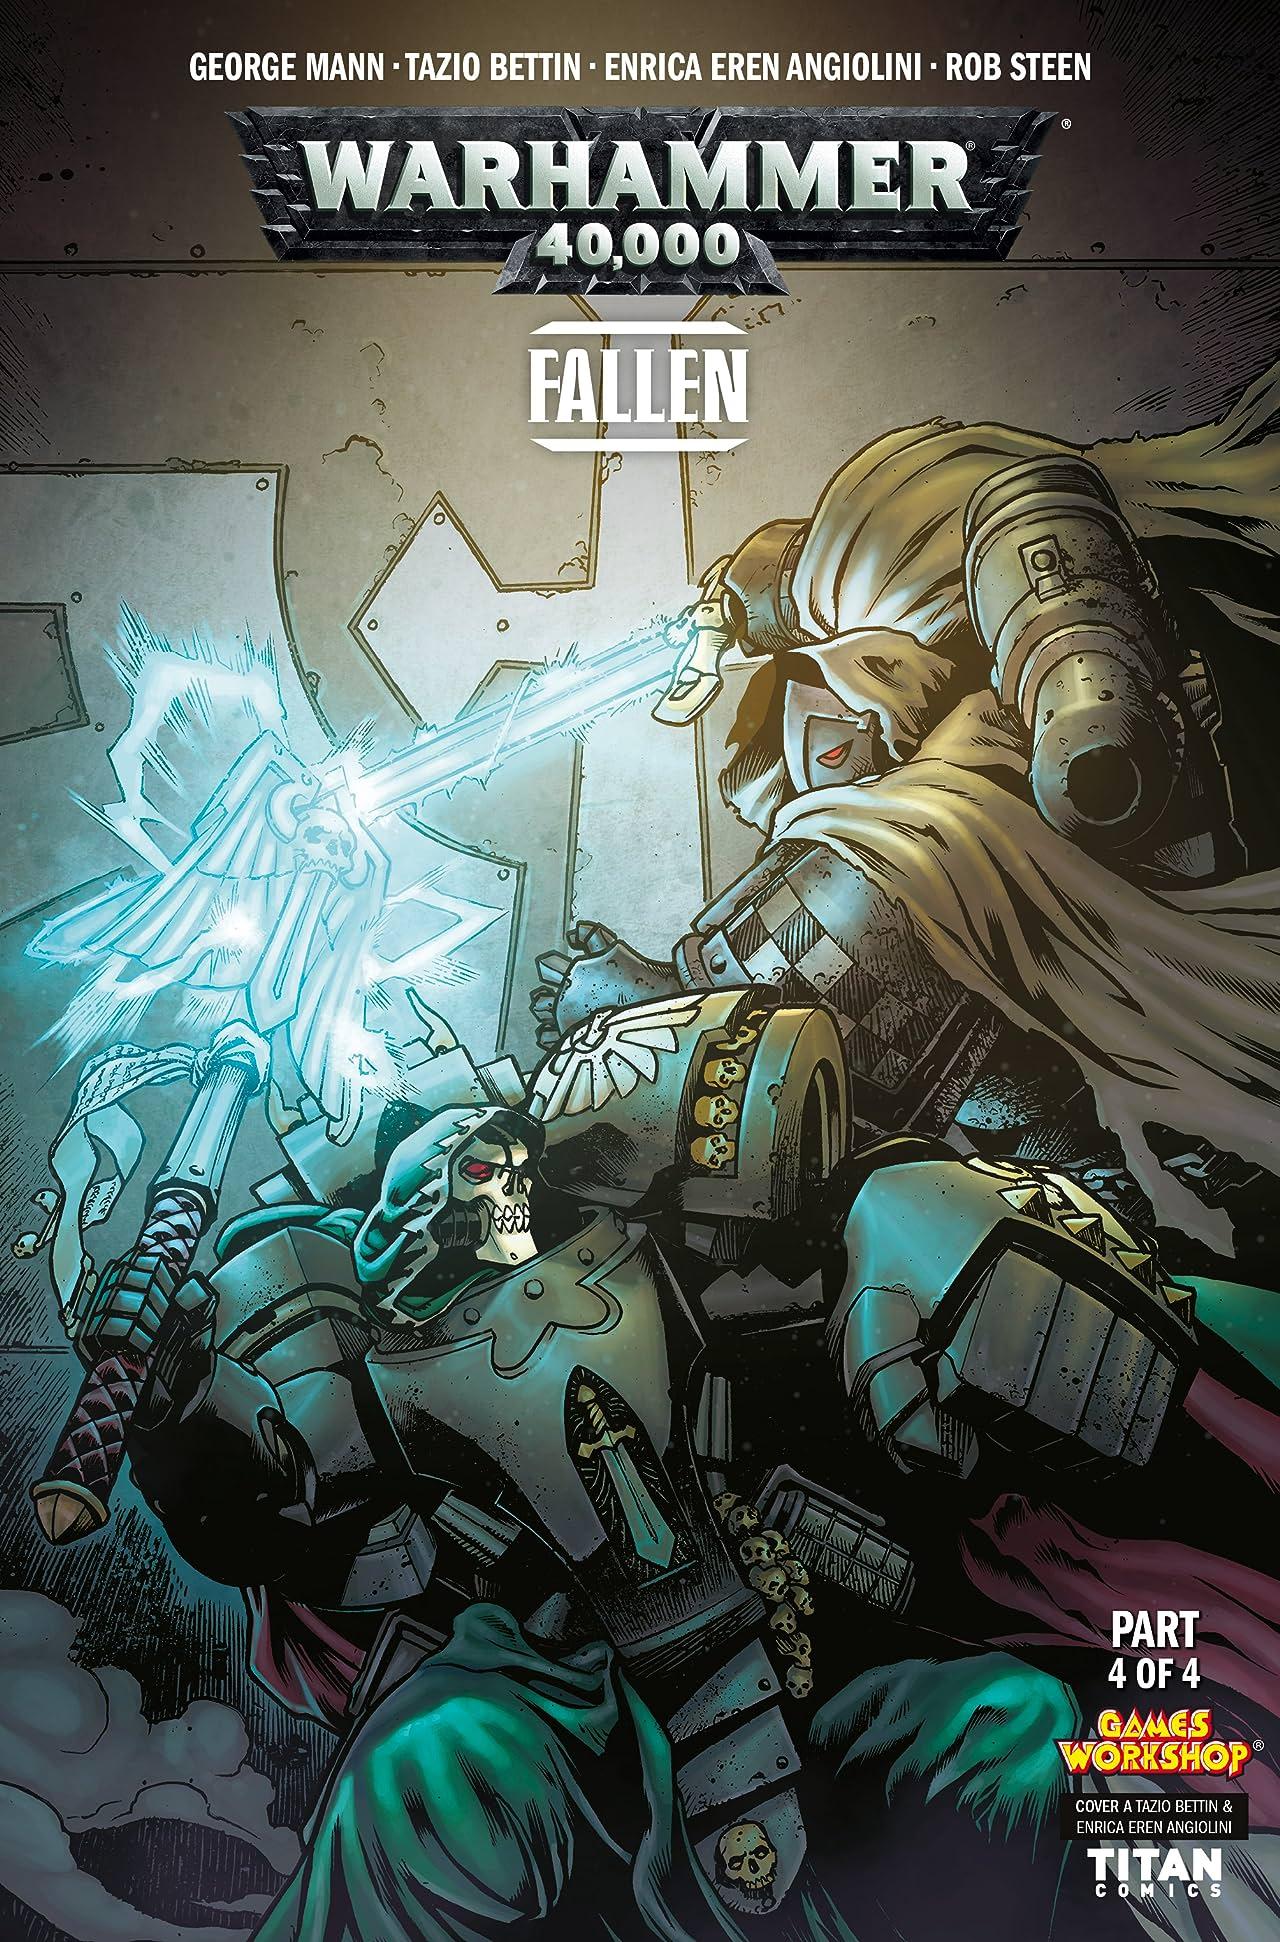 Warhammer 40,000 #12: Fallen